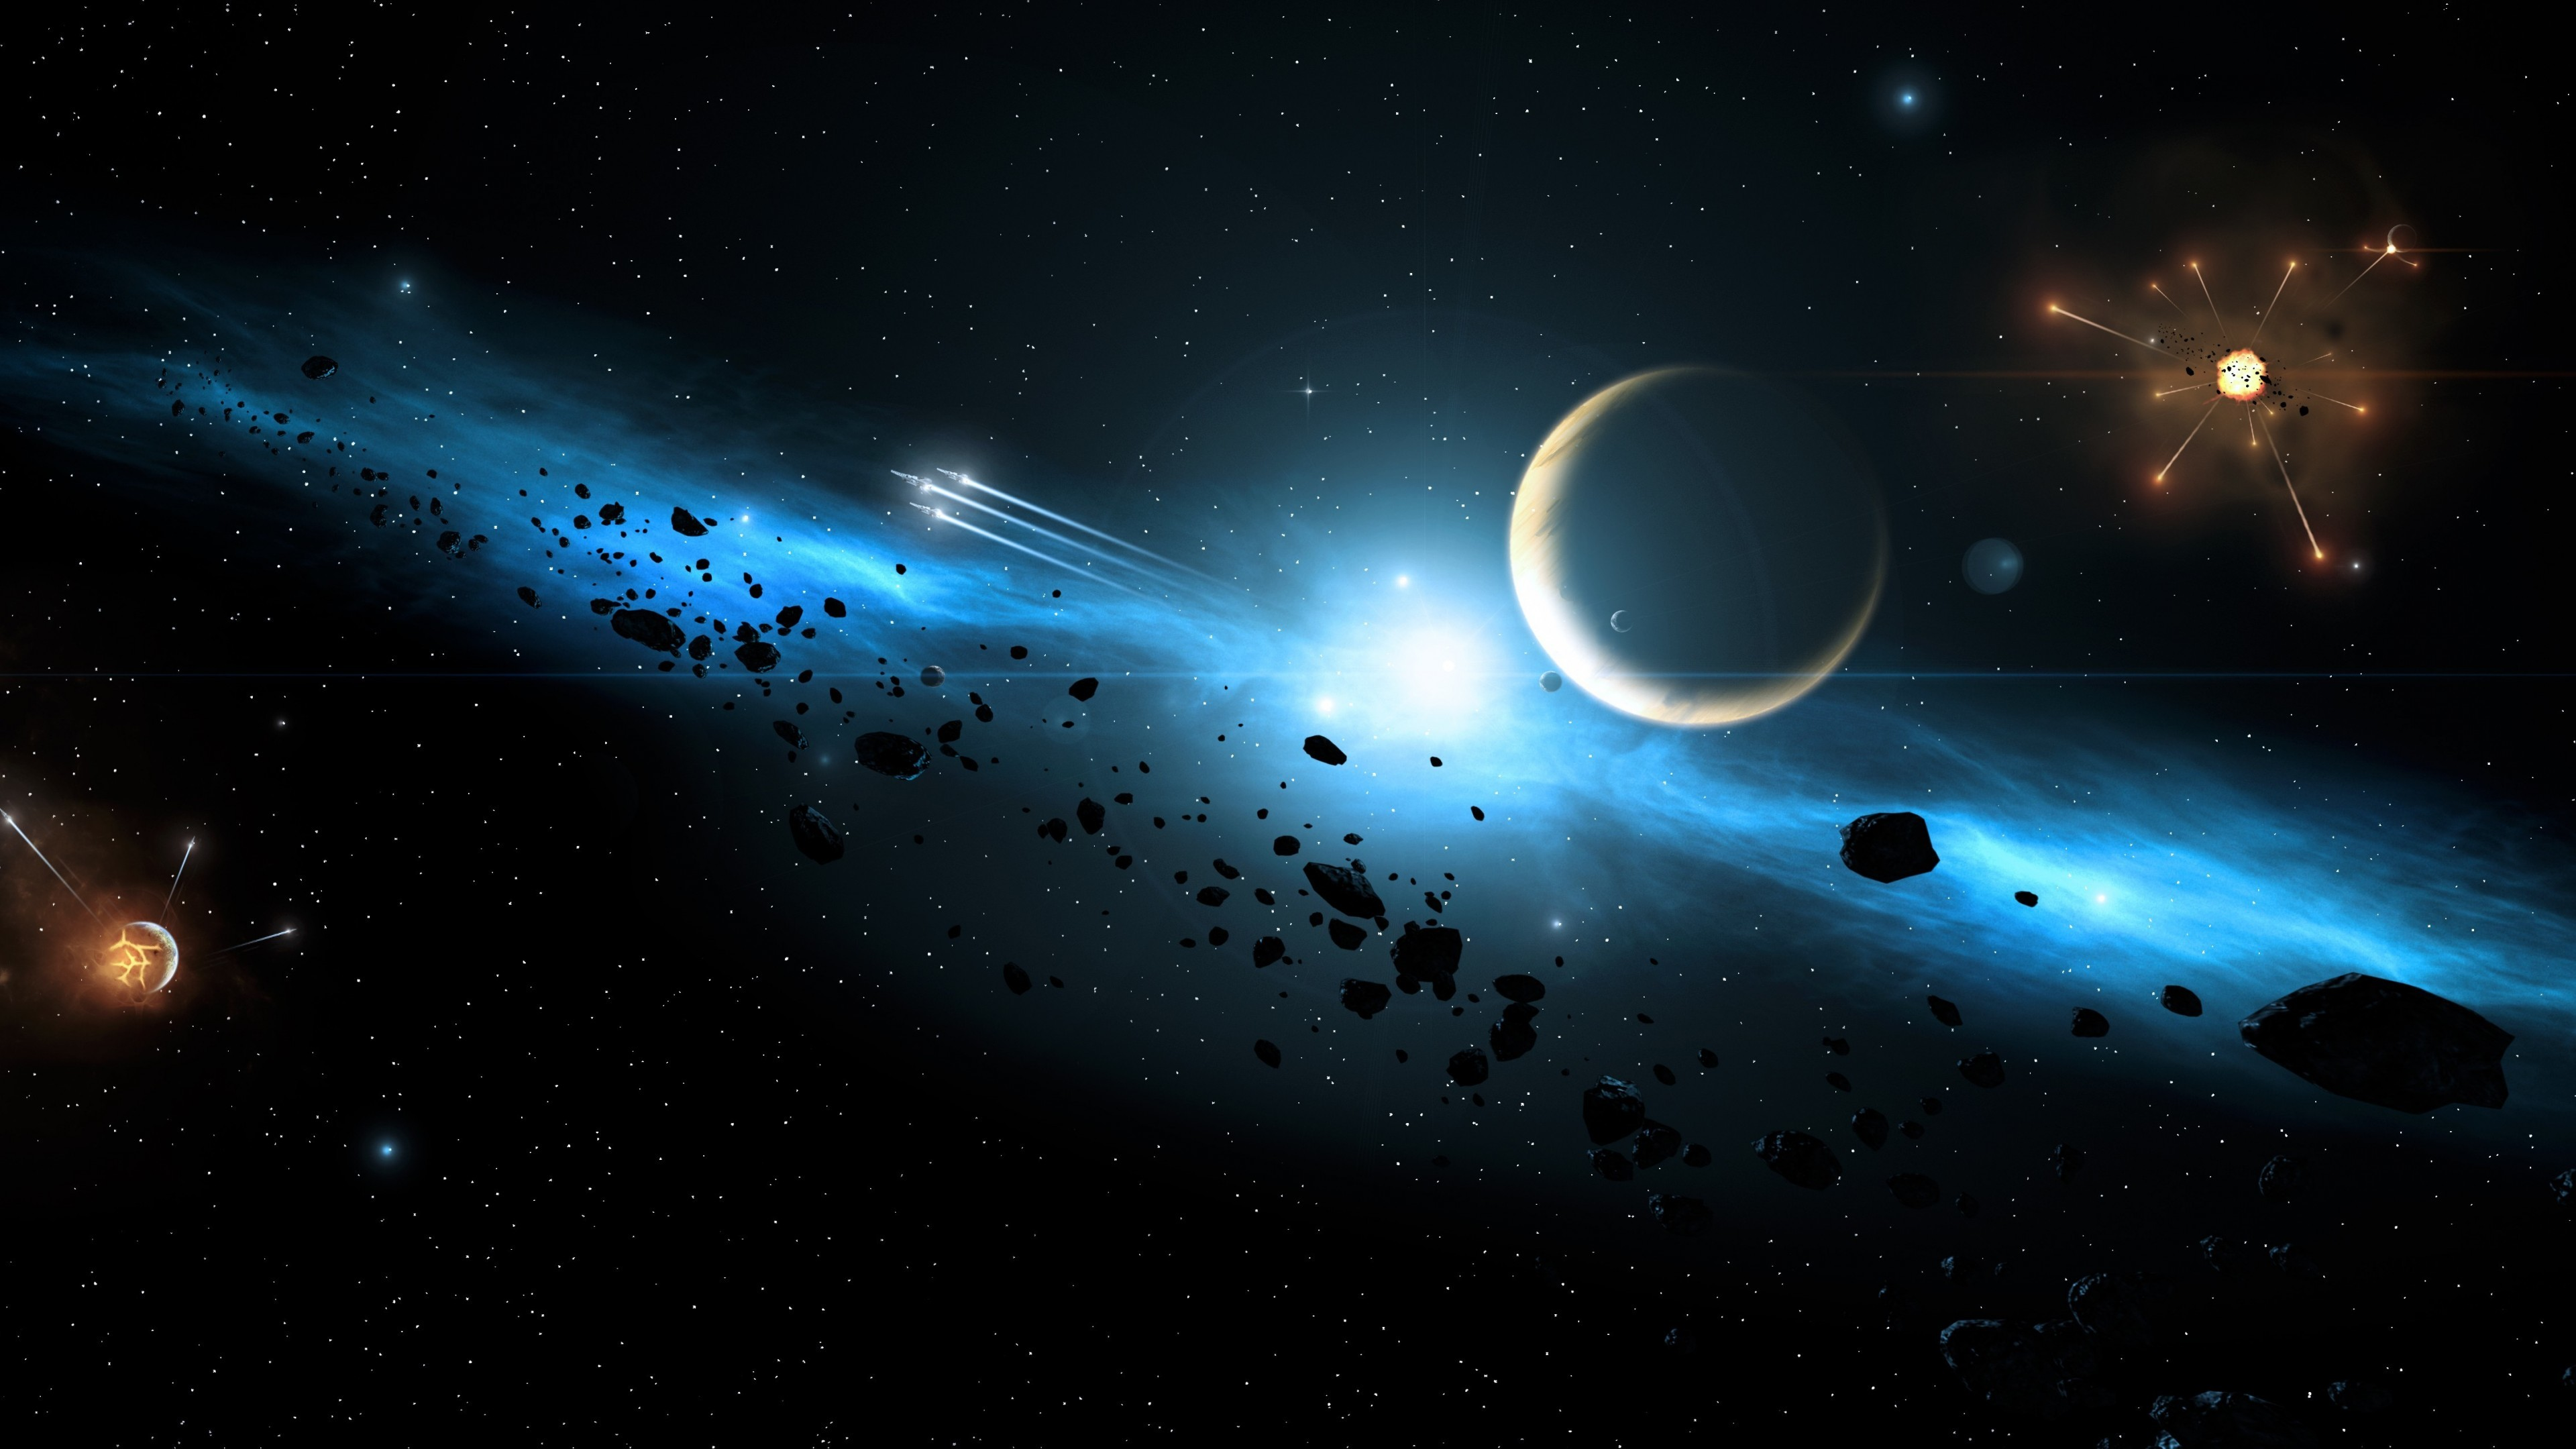 Tags: Planets, Galaxy, 5K